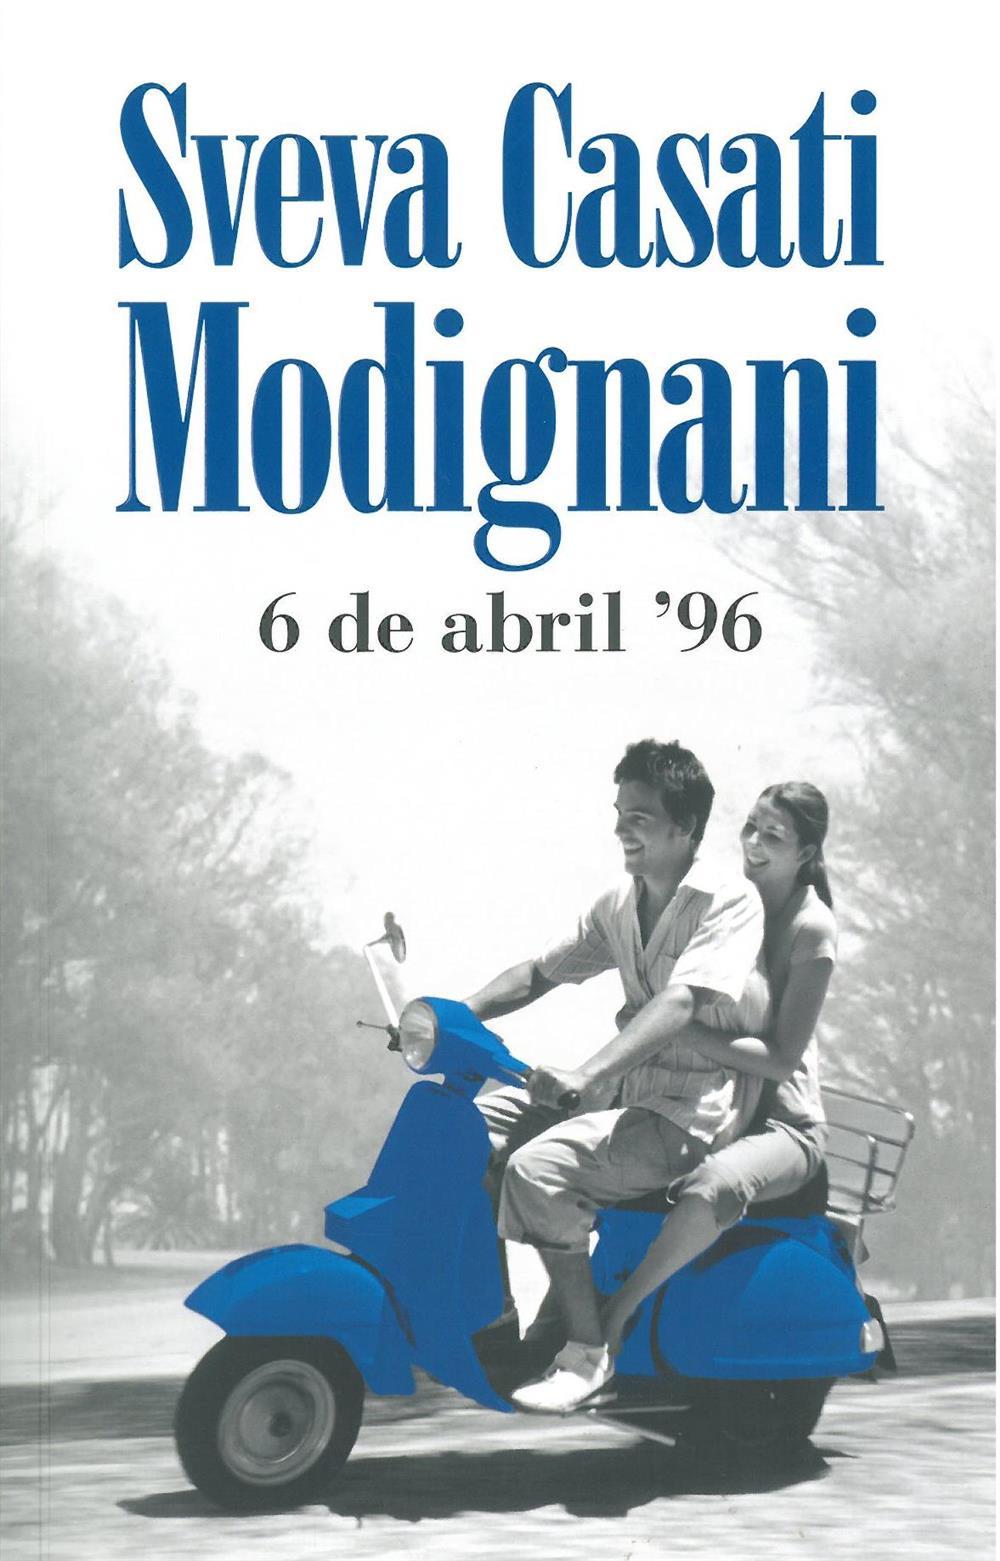 6 de abril '96_.jpg